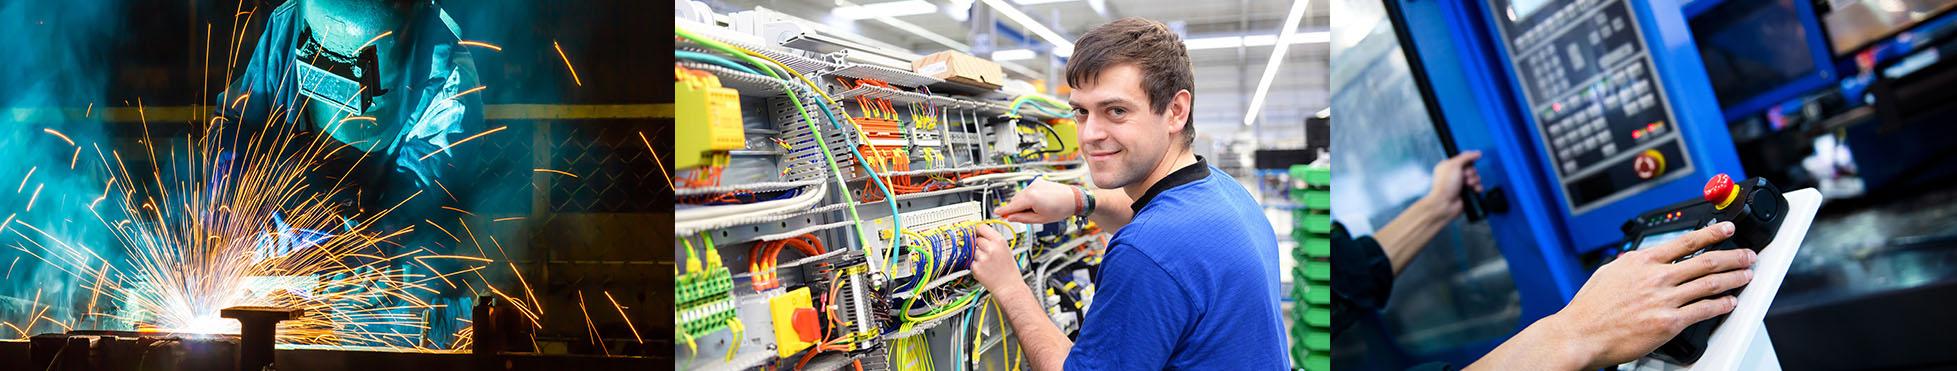 bildleiste berufsgruppen agil personalservice metallverarbeitung elektriker lagerlogistik